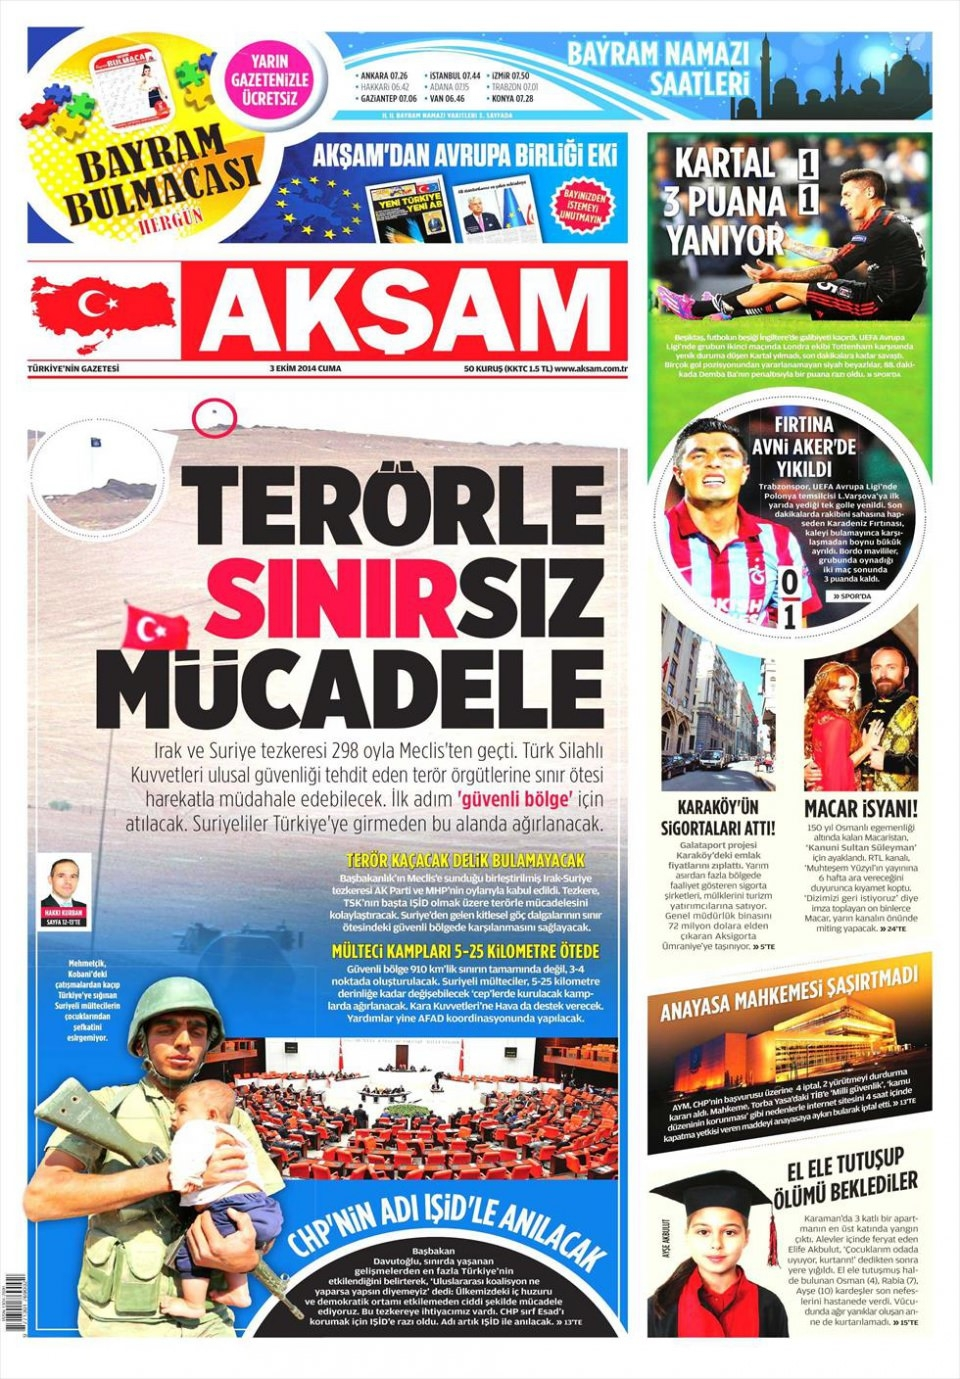 3 Ekim 2014 gazete manşetleri 1